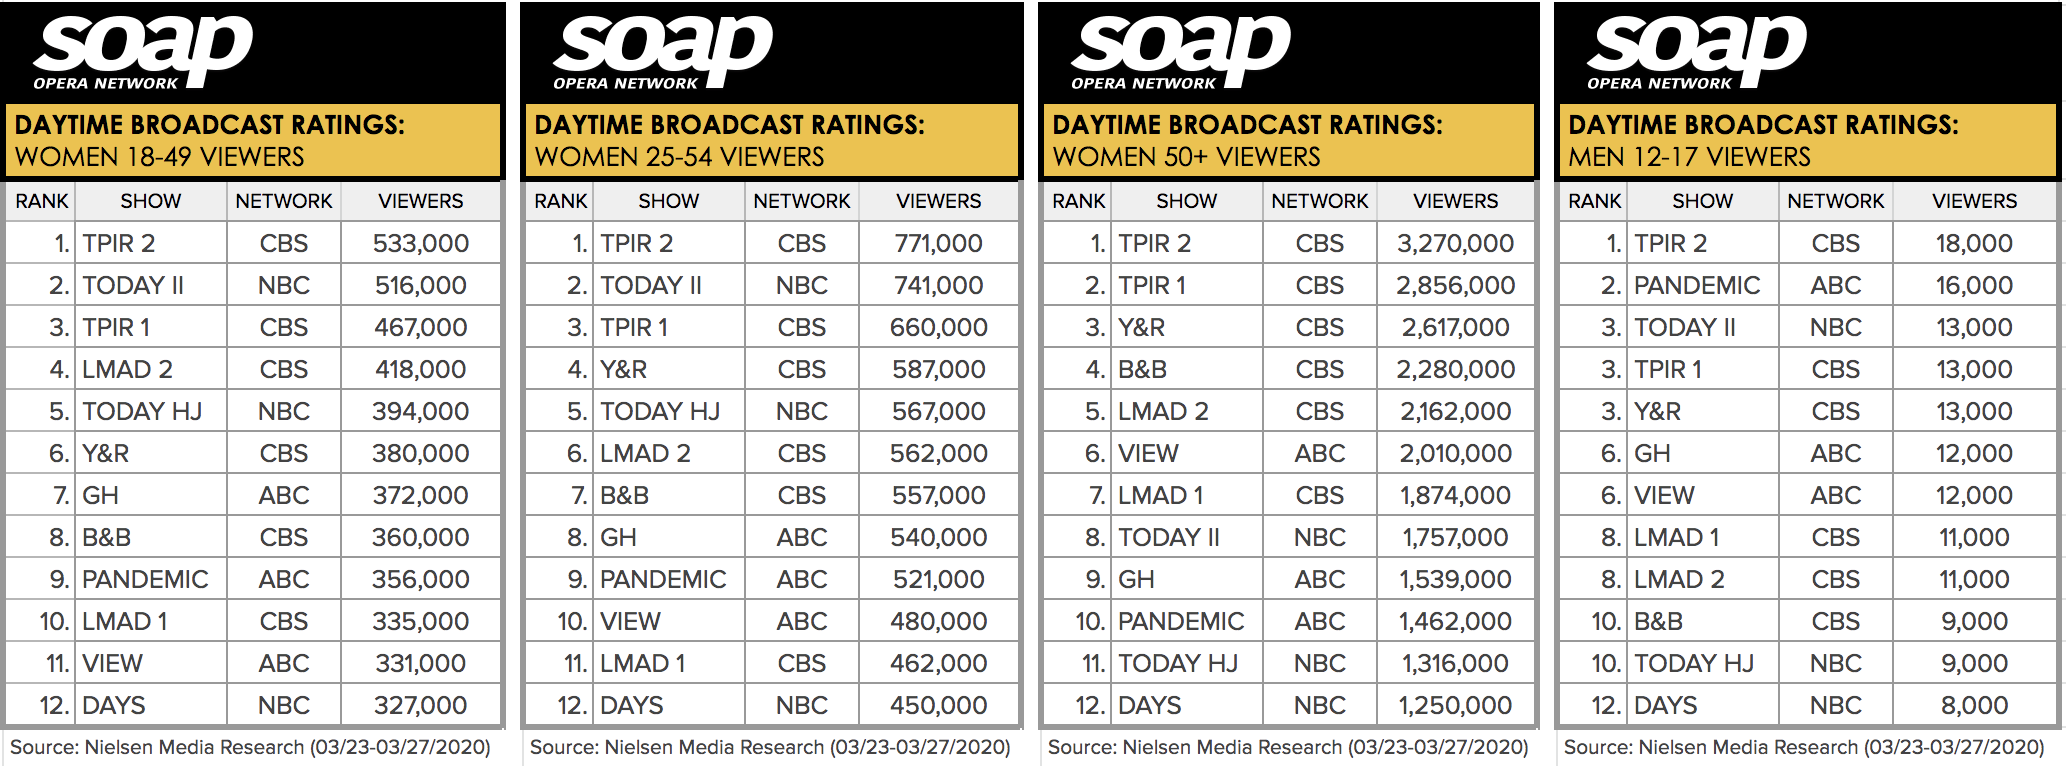 Soap Opera Network, Daytime Broadcast Ratings, Week 26